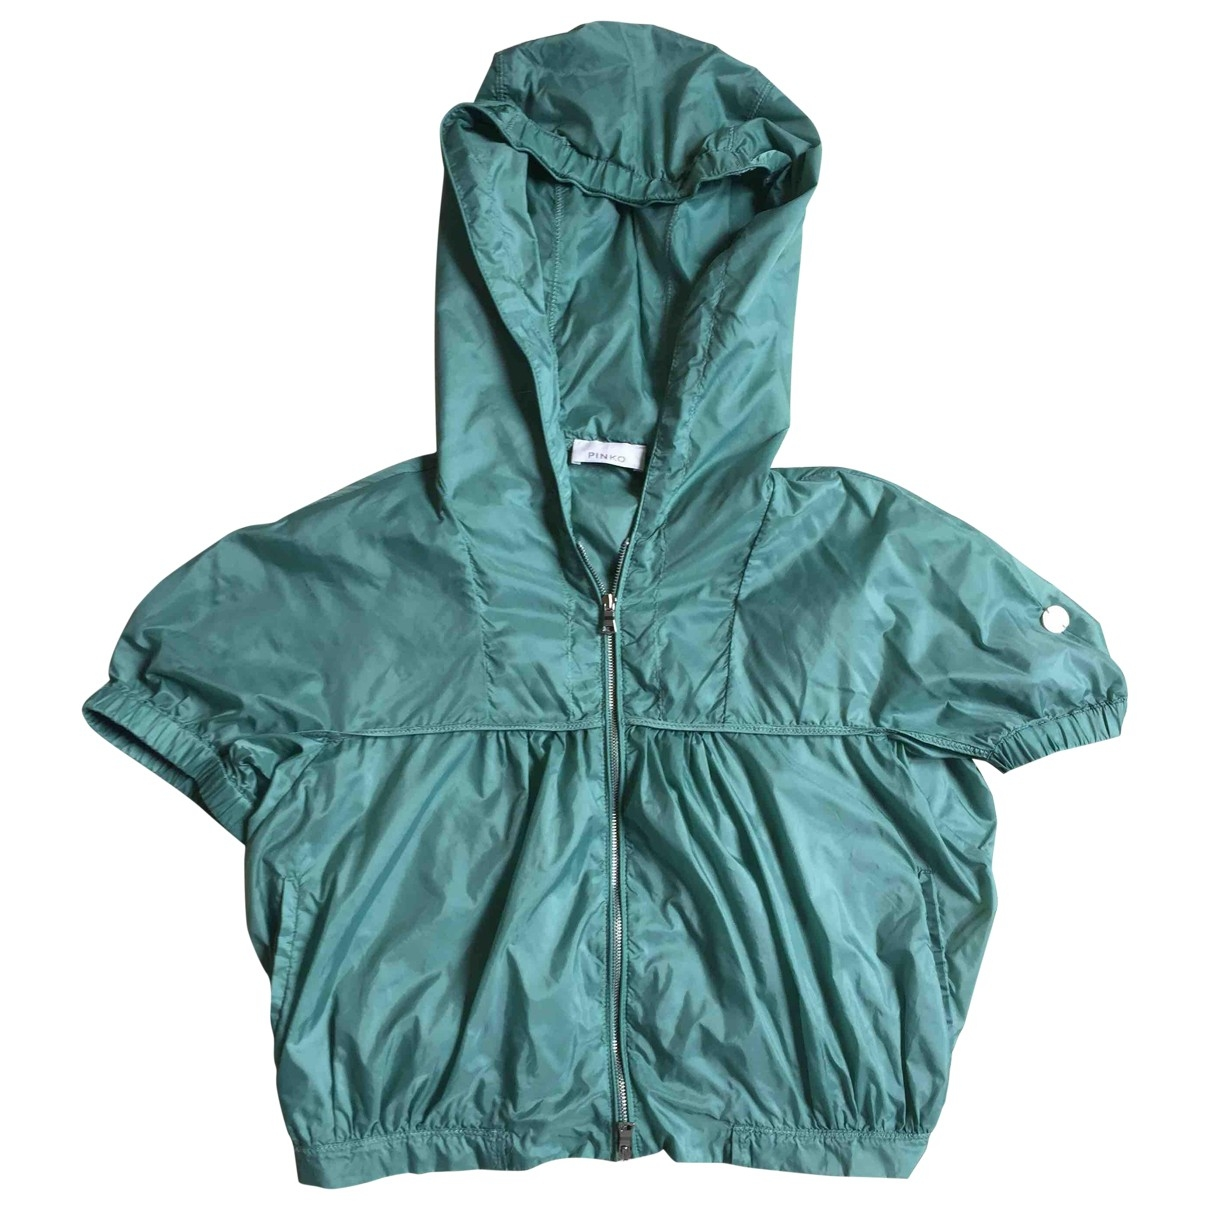 Pinko \N Turquoise jacket for Women 40 IT